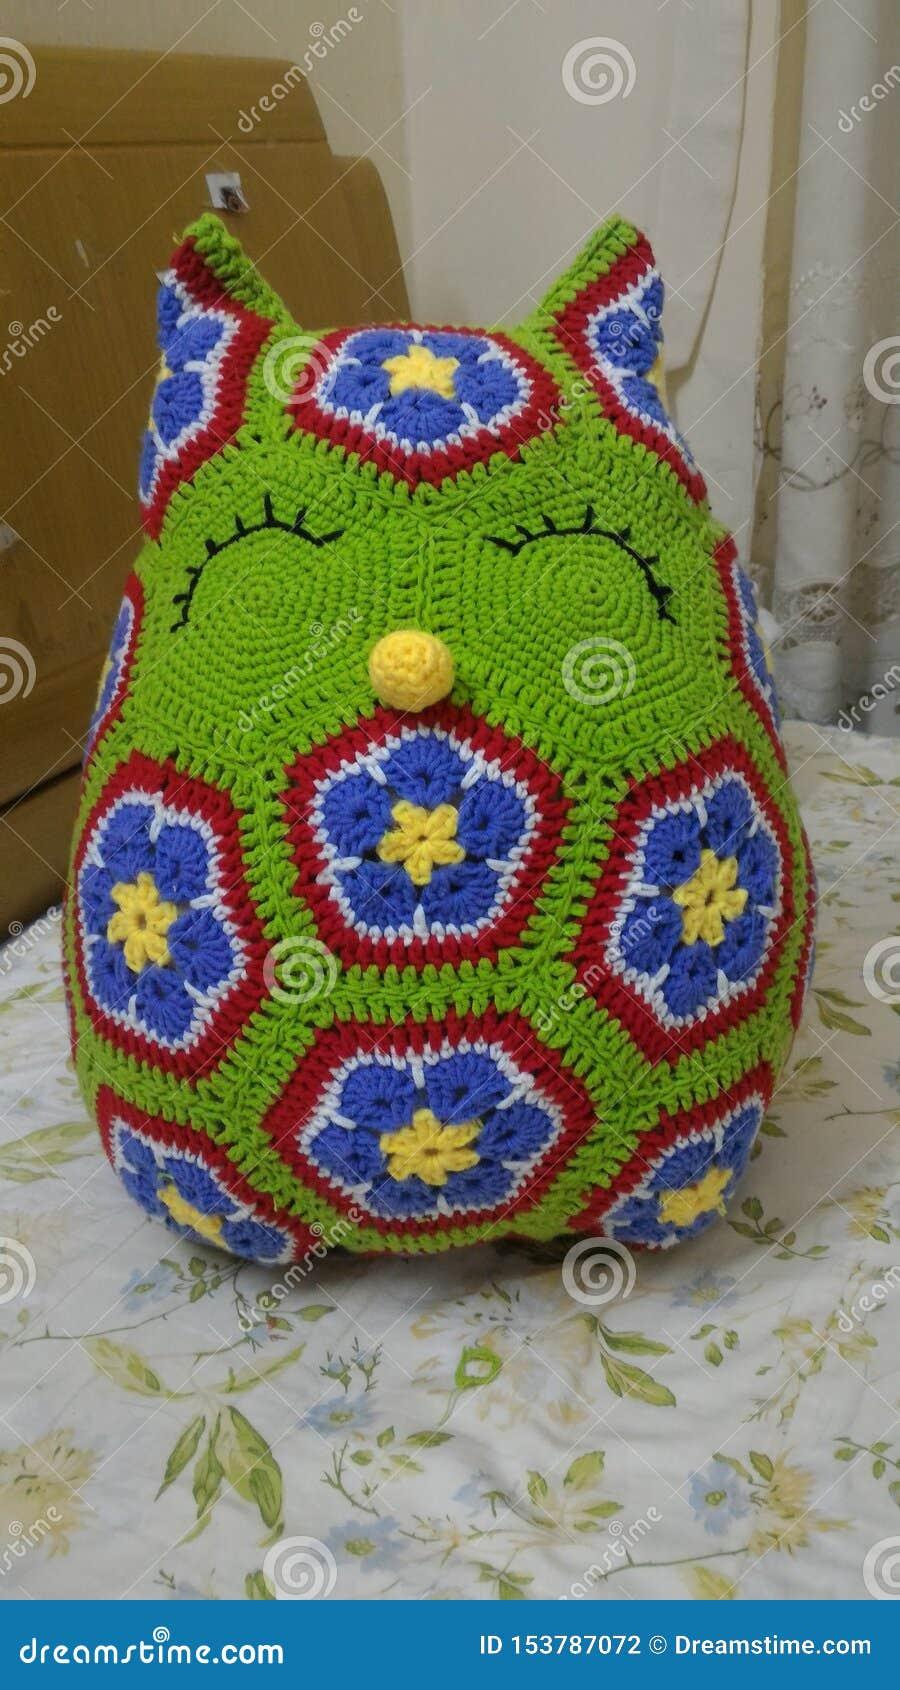 6 Fun Animal Cat Pillow Free Crochet Pattern and Paid – – #Animal ...   1689x900